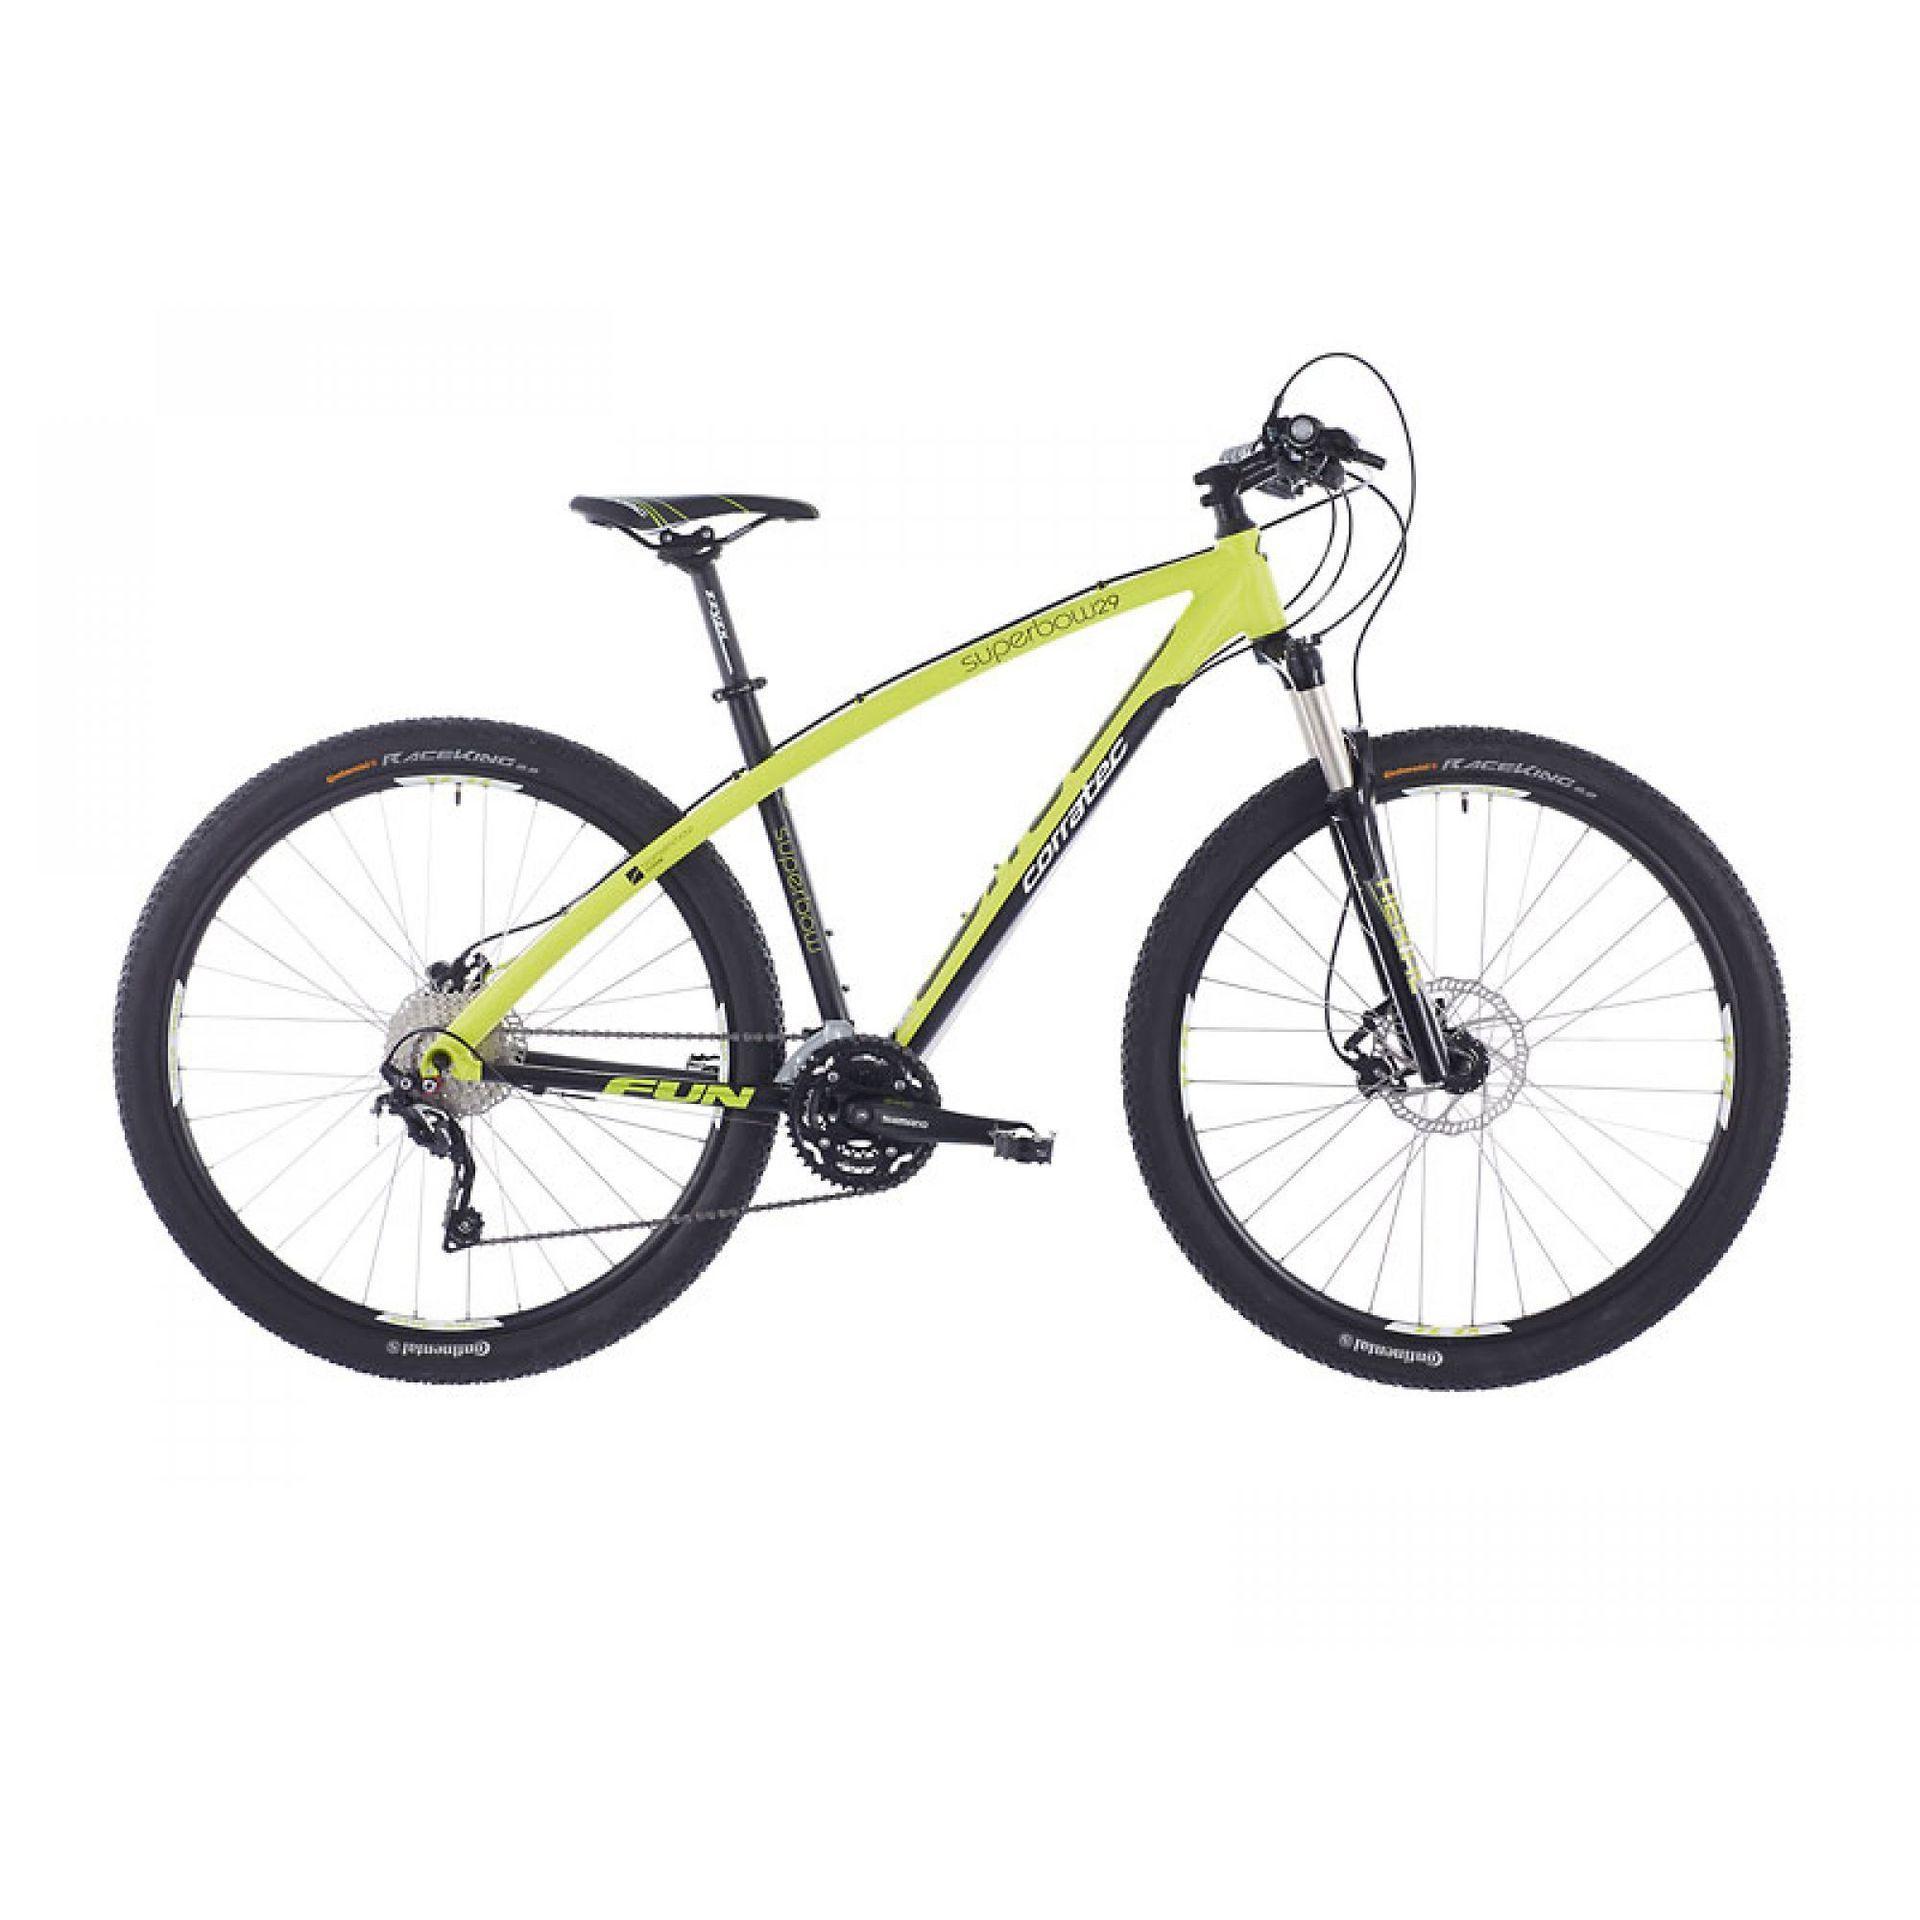 Rower Corratec Super Bow Race czarno zielony